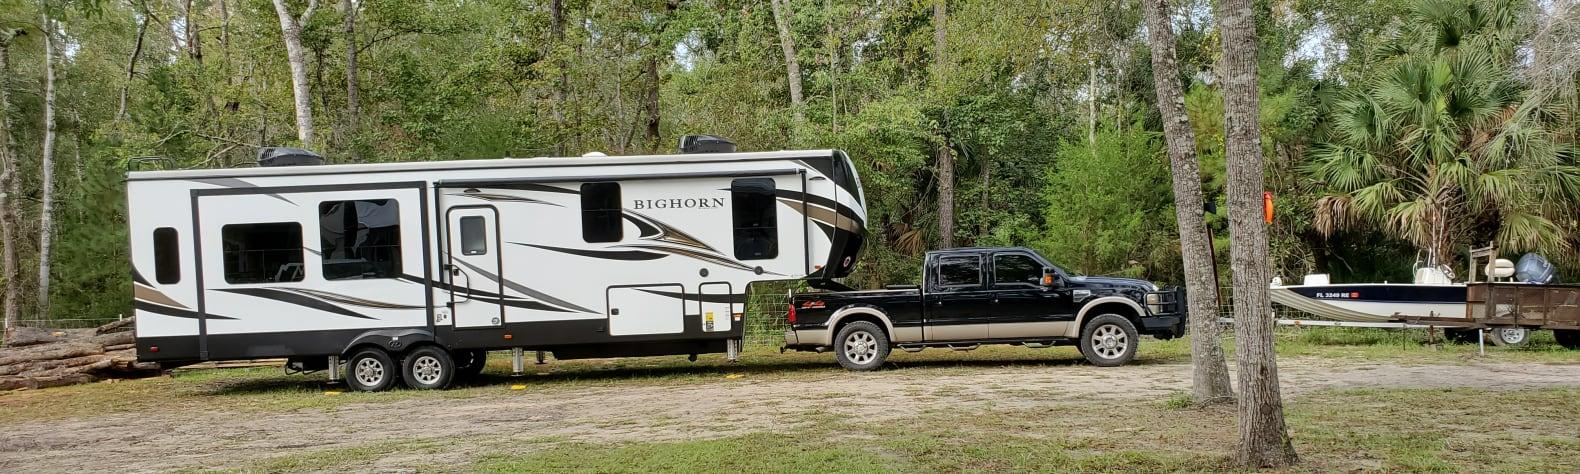 S & D's campsites